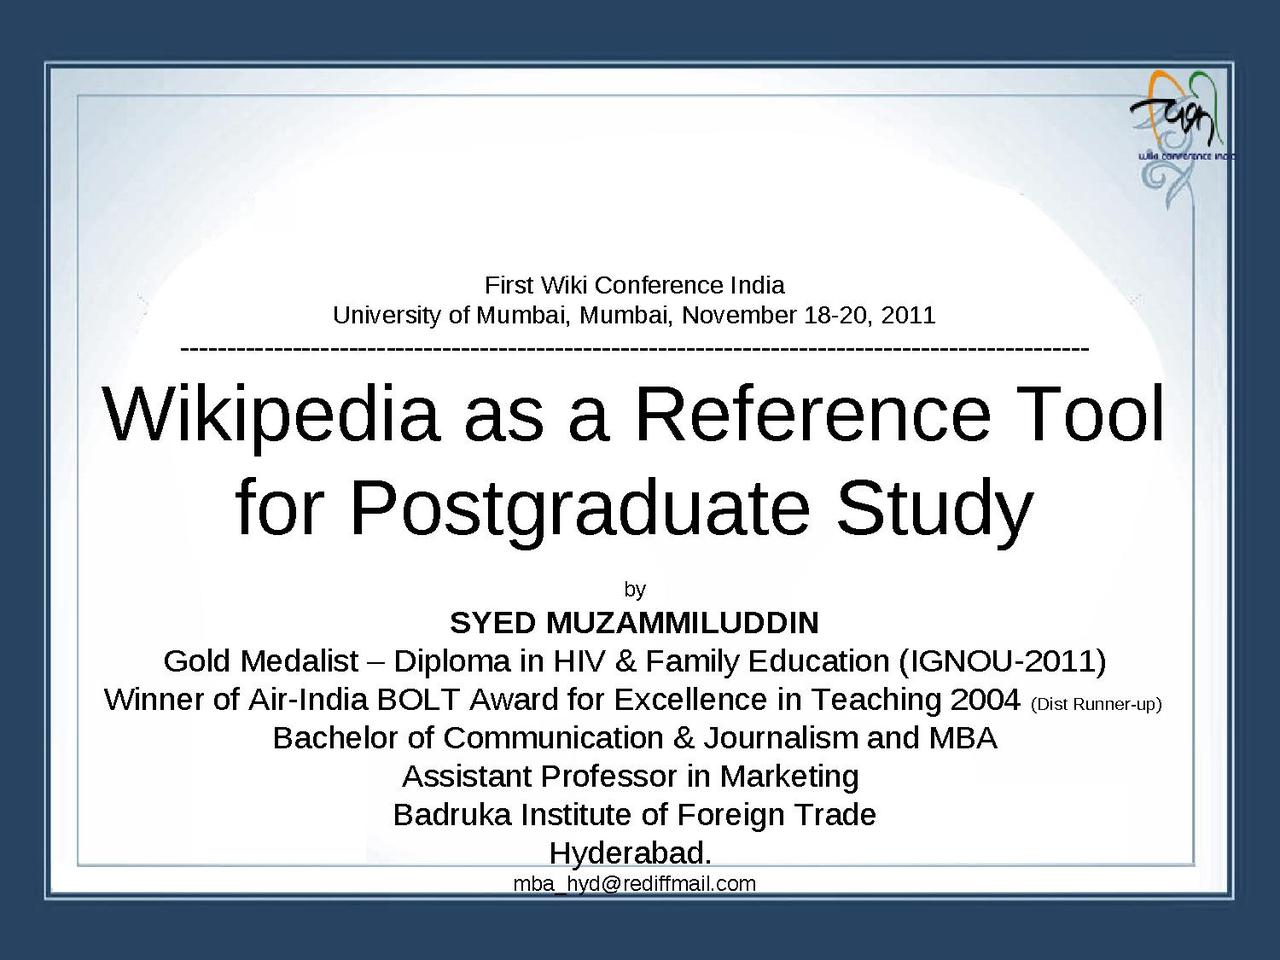 Reference postgraduate study